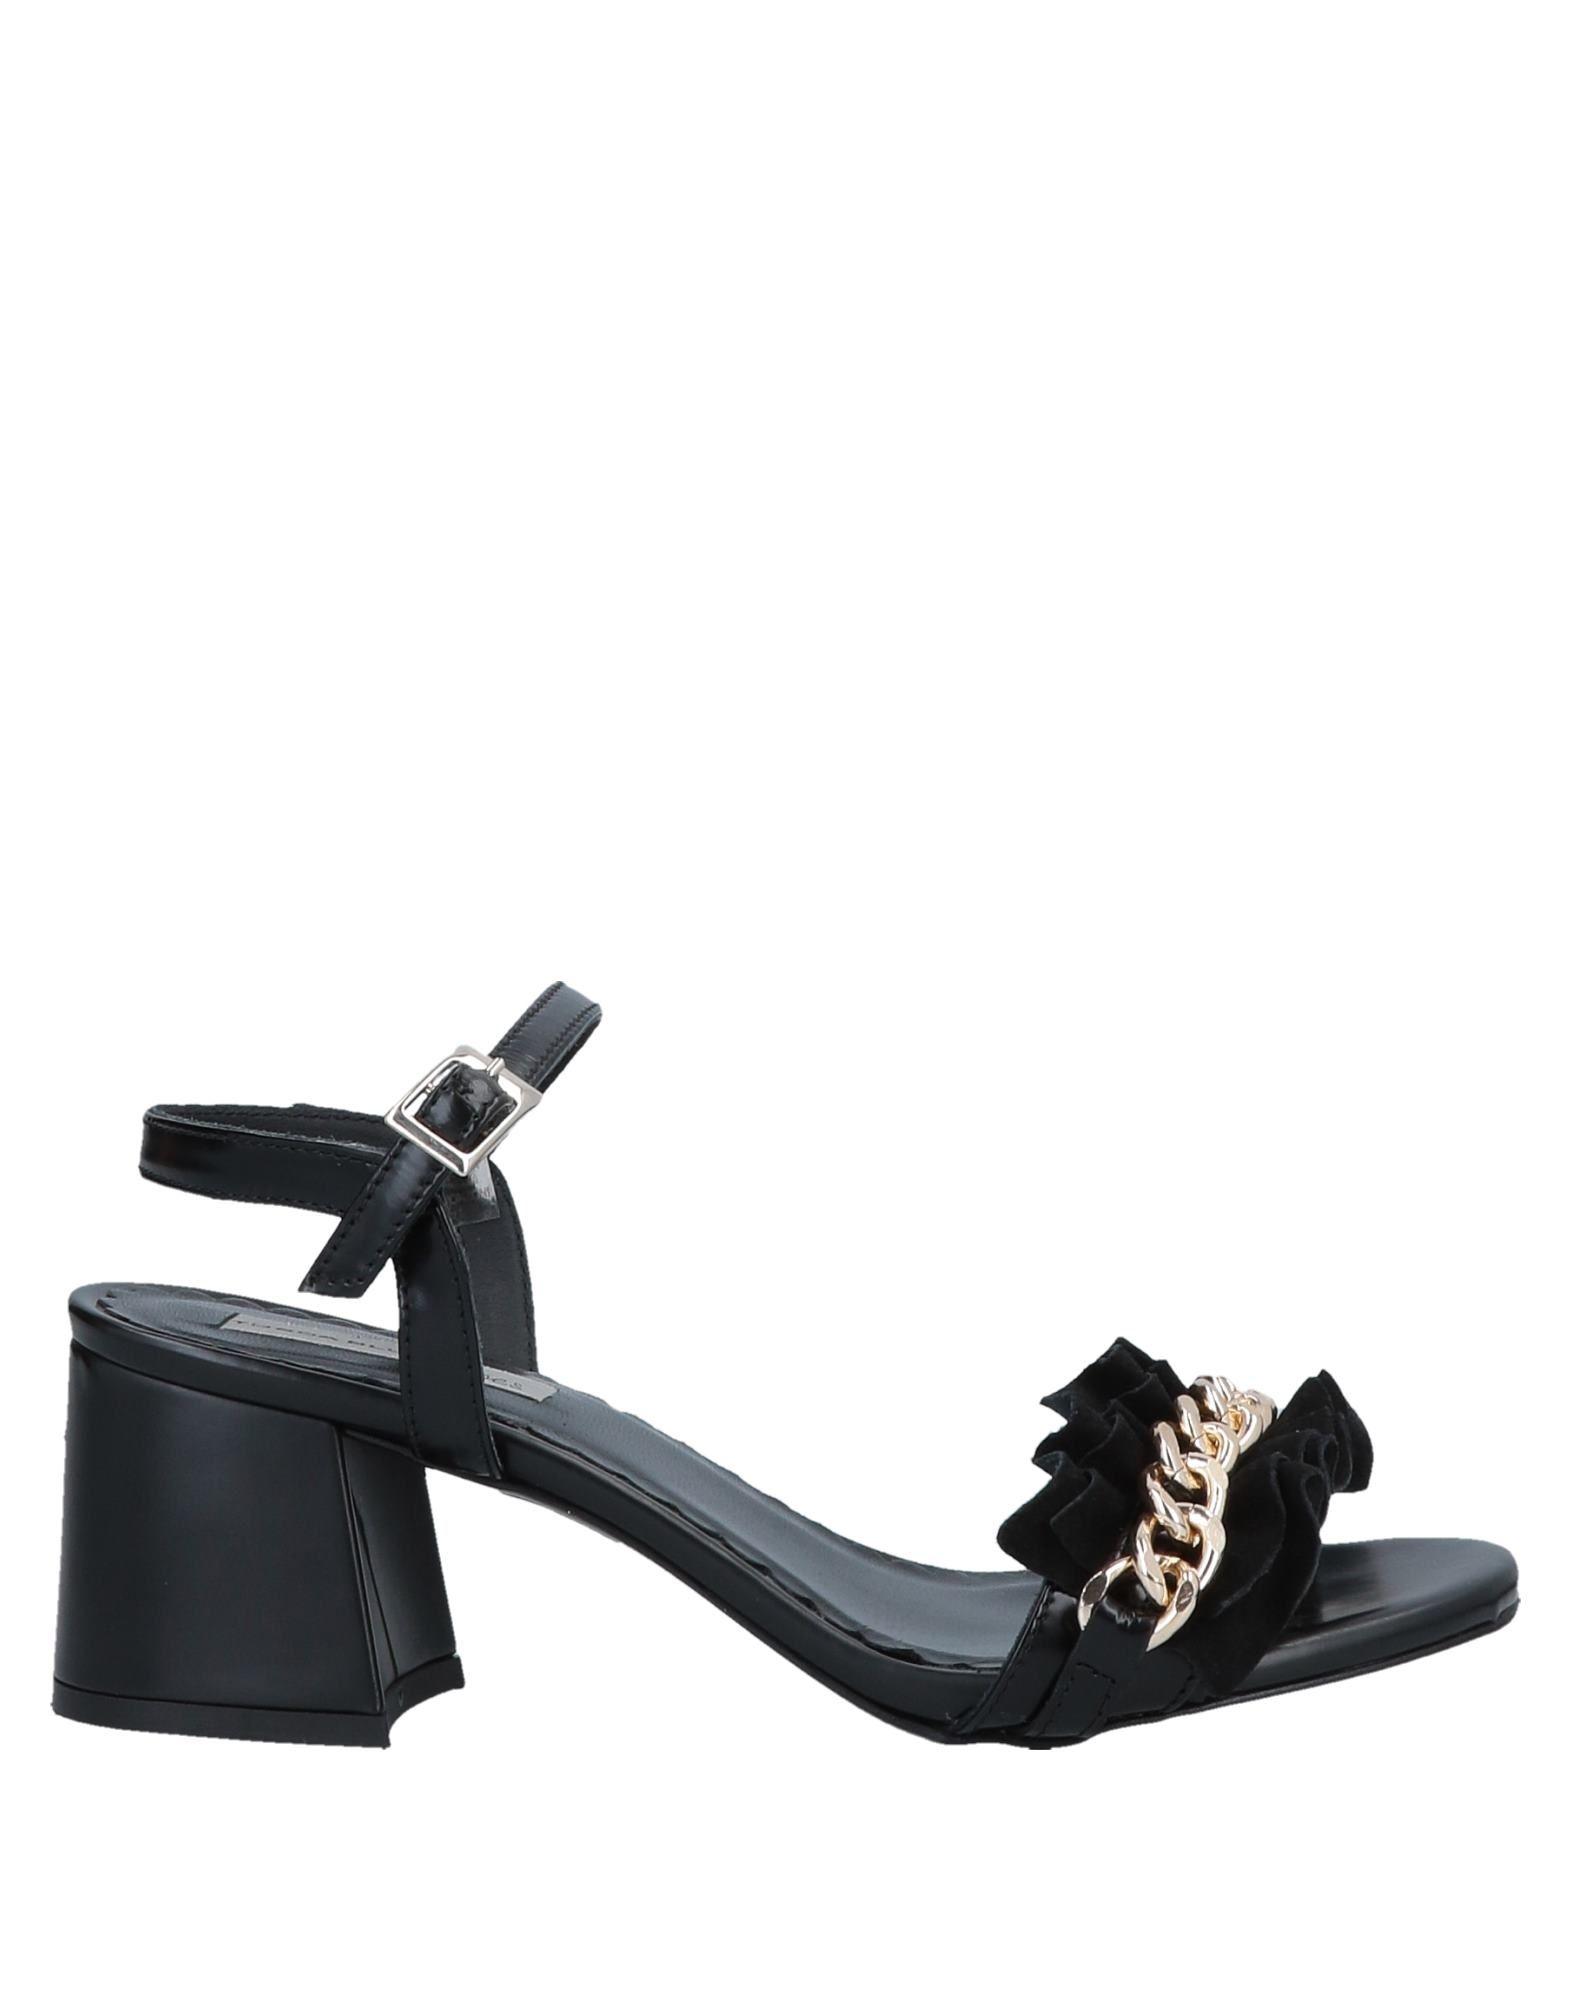 Фото - TOSCA BLU SHOES Сандалии women high heel shoes platform pumps woman thin high heels party wedding shoes ladies kitten heels plus size 34 40 41 42 43